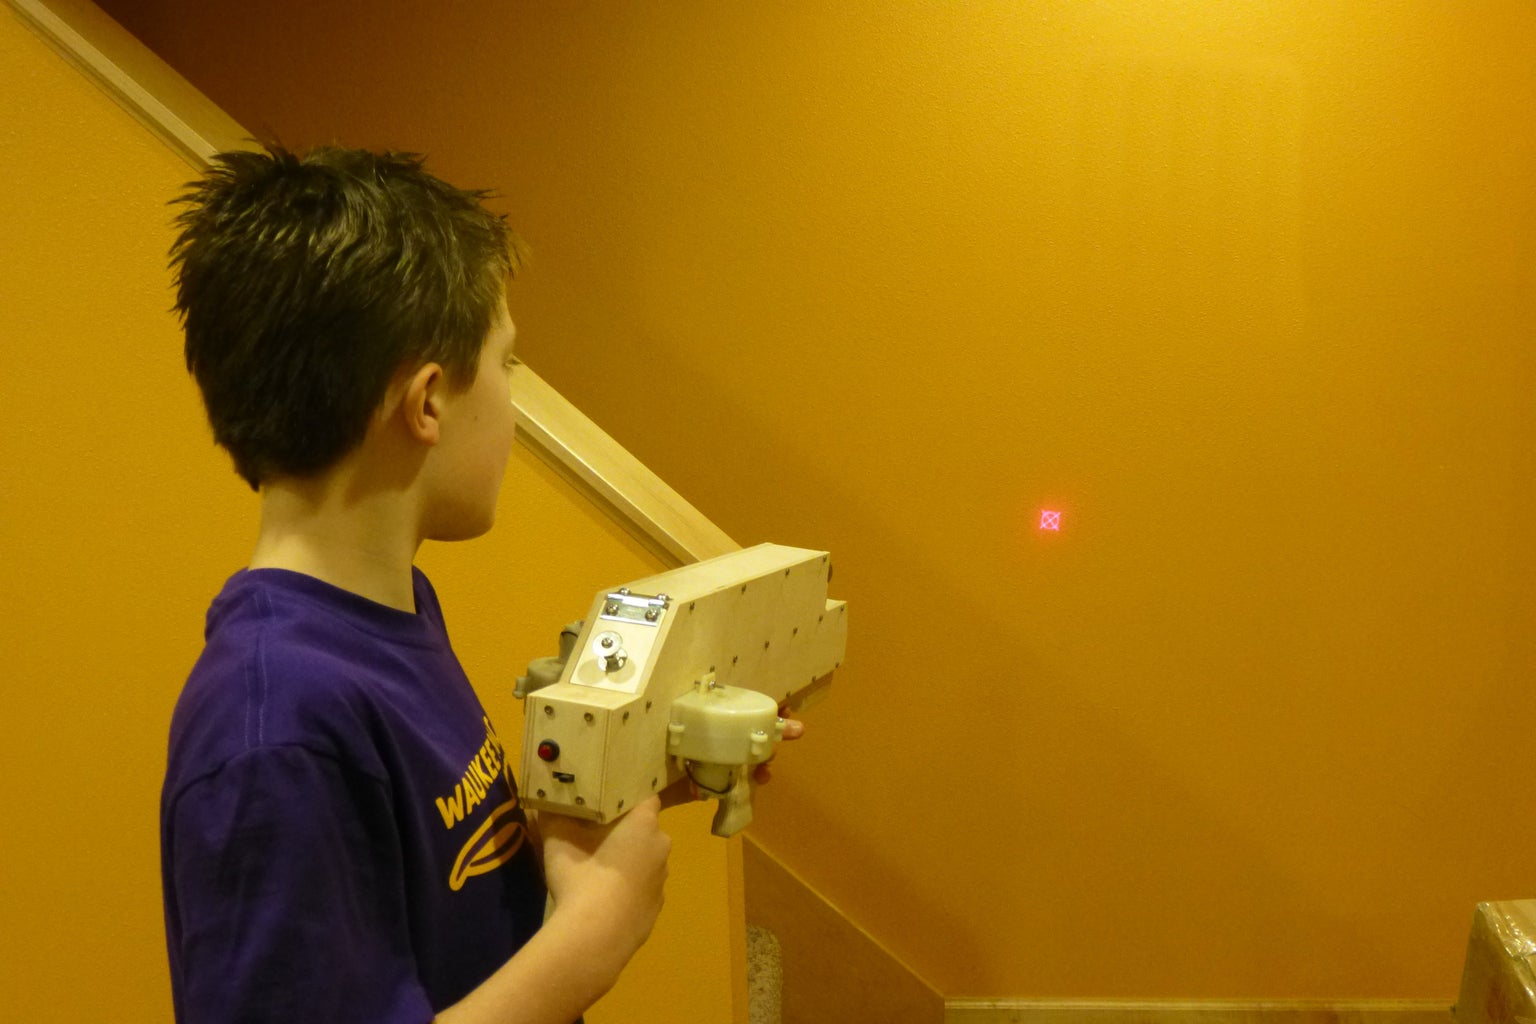 Motorized Ping Pong Ball Guns